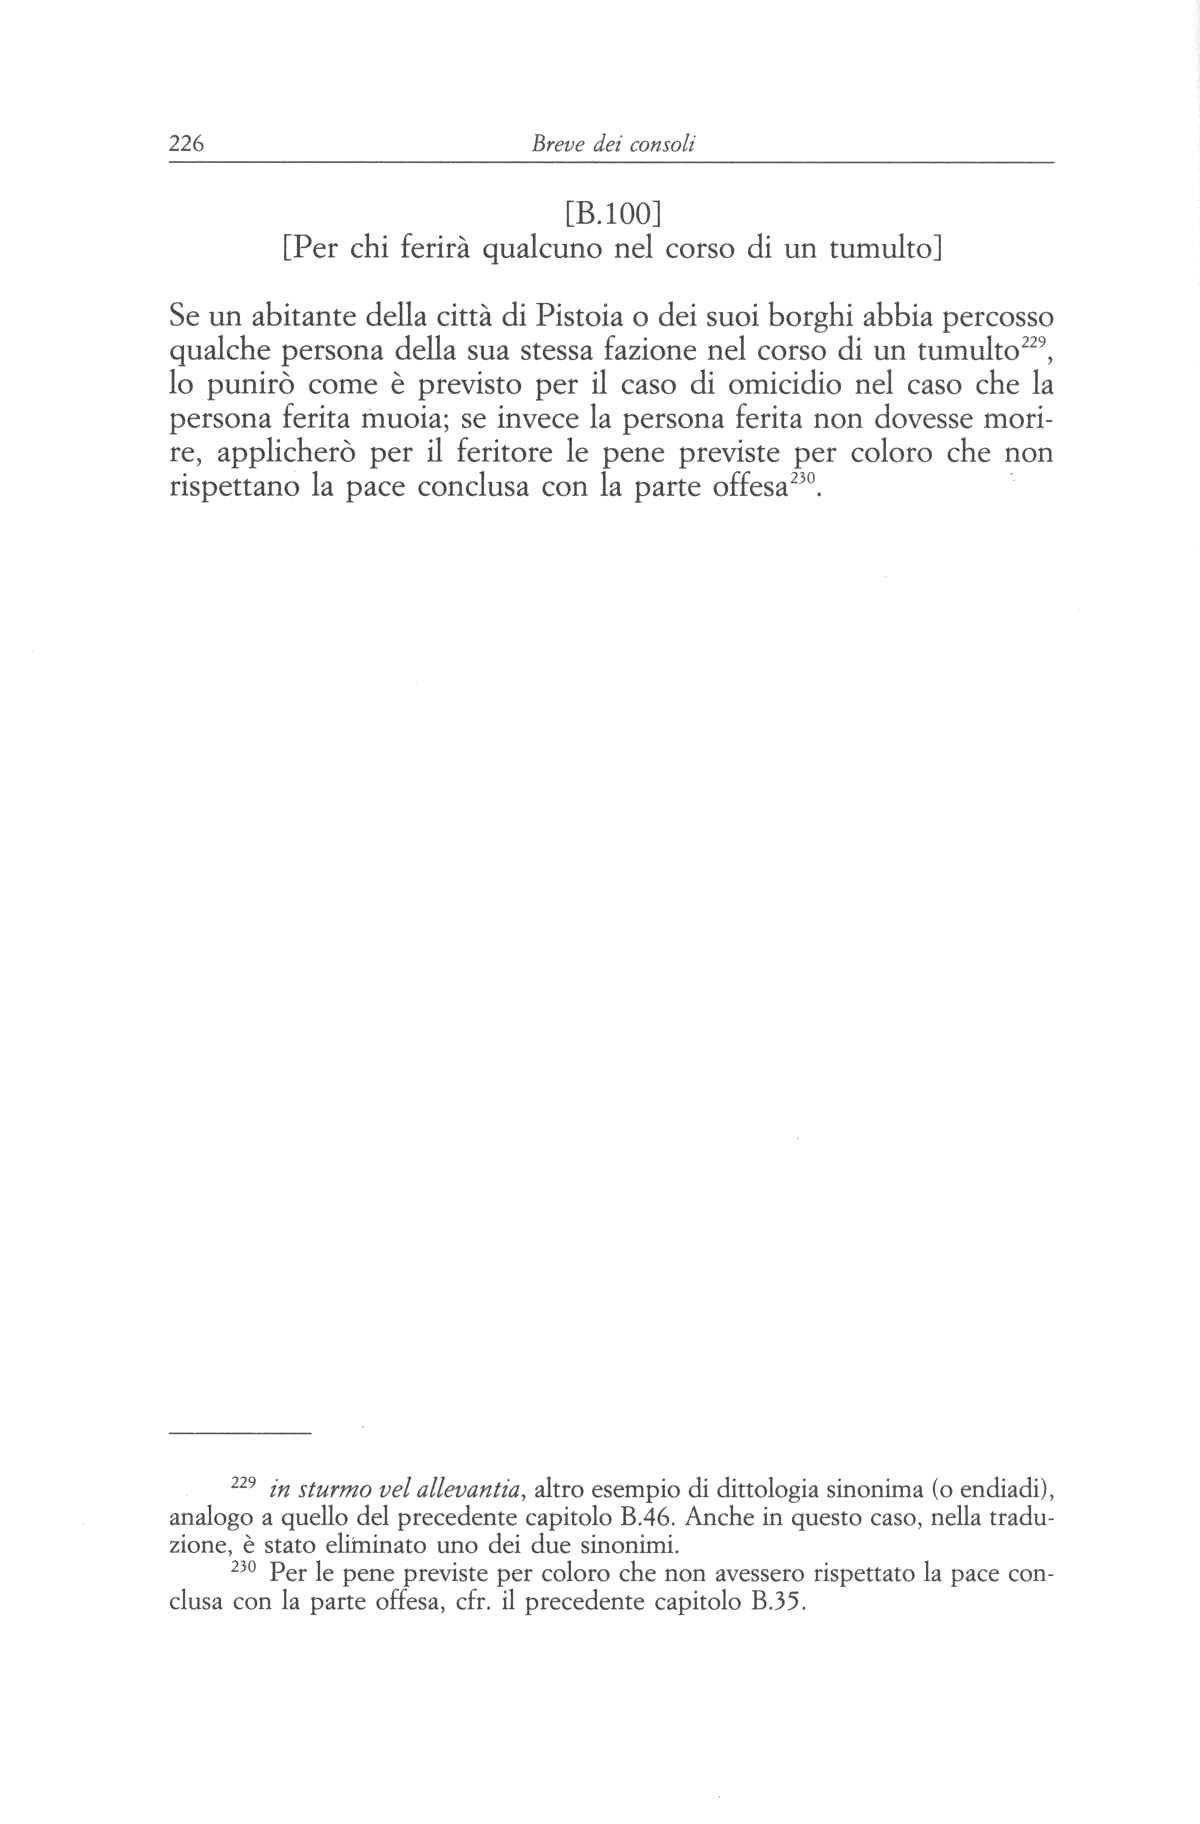 statuti pistoiesi del sec.XII 0226.jpg